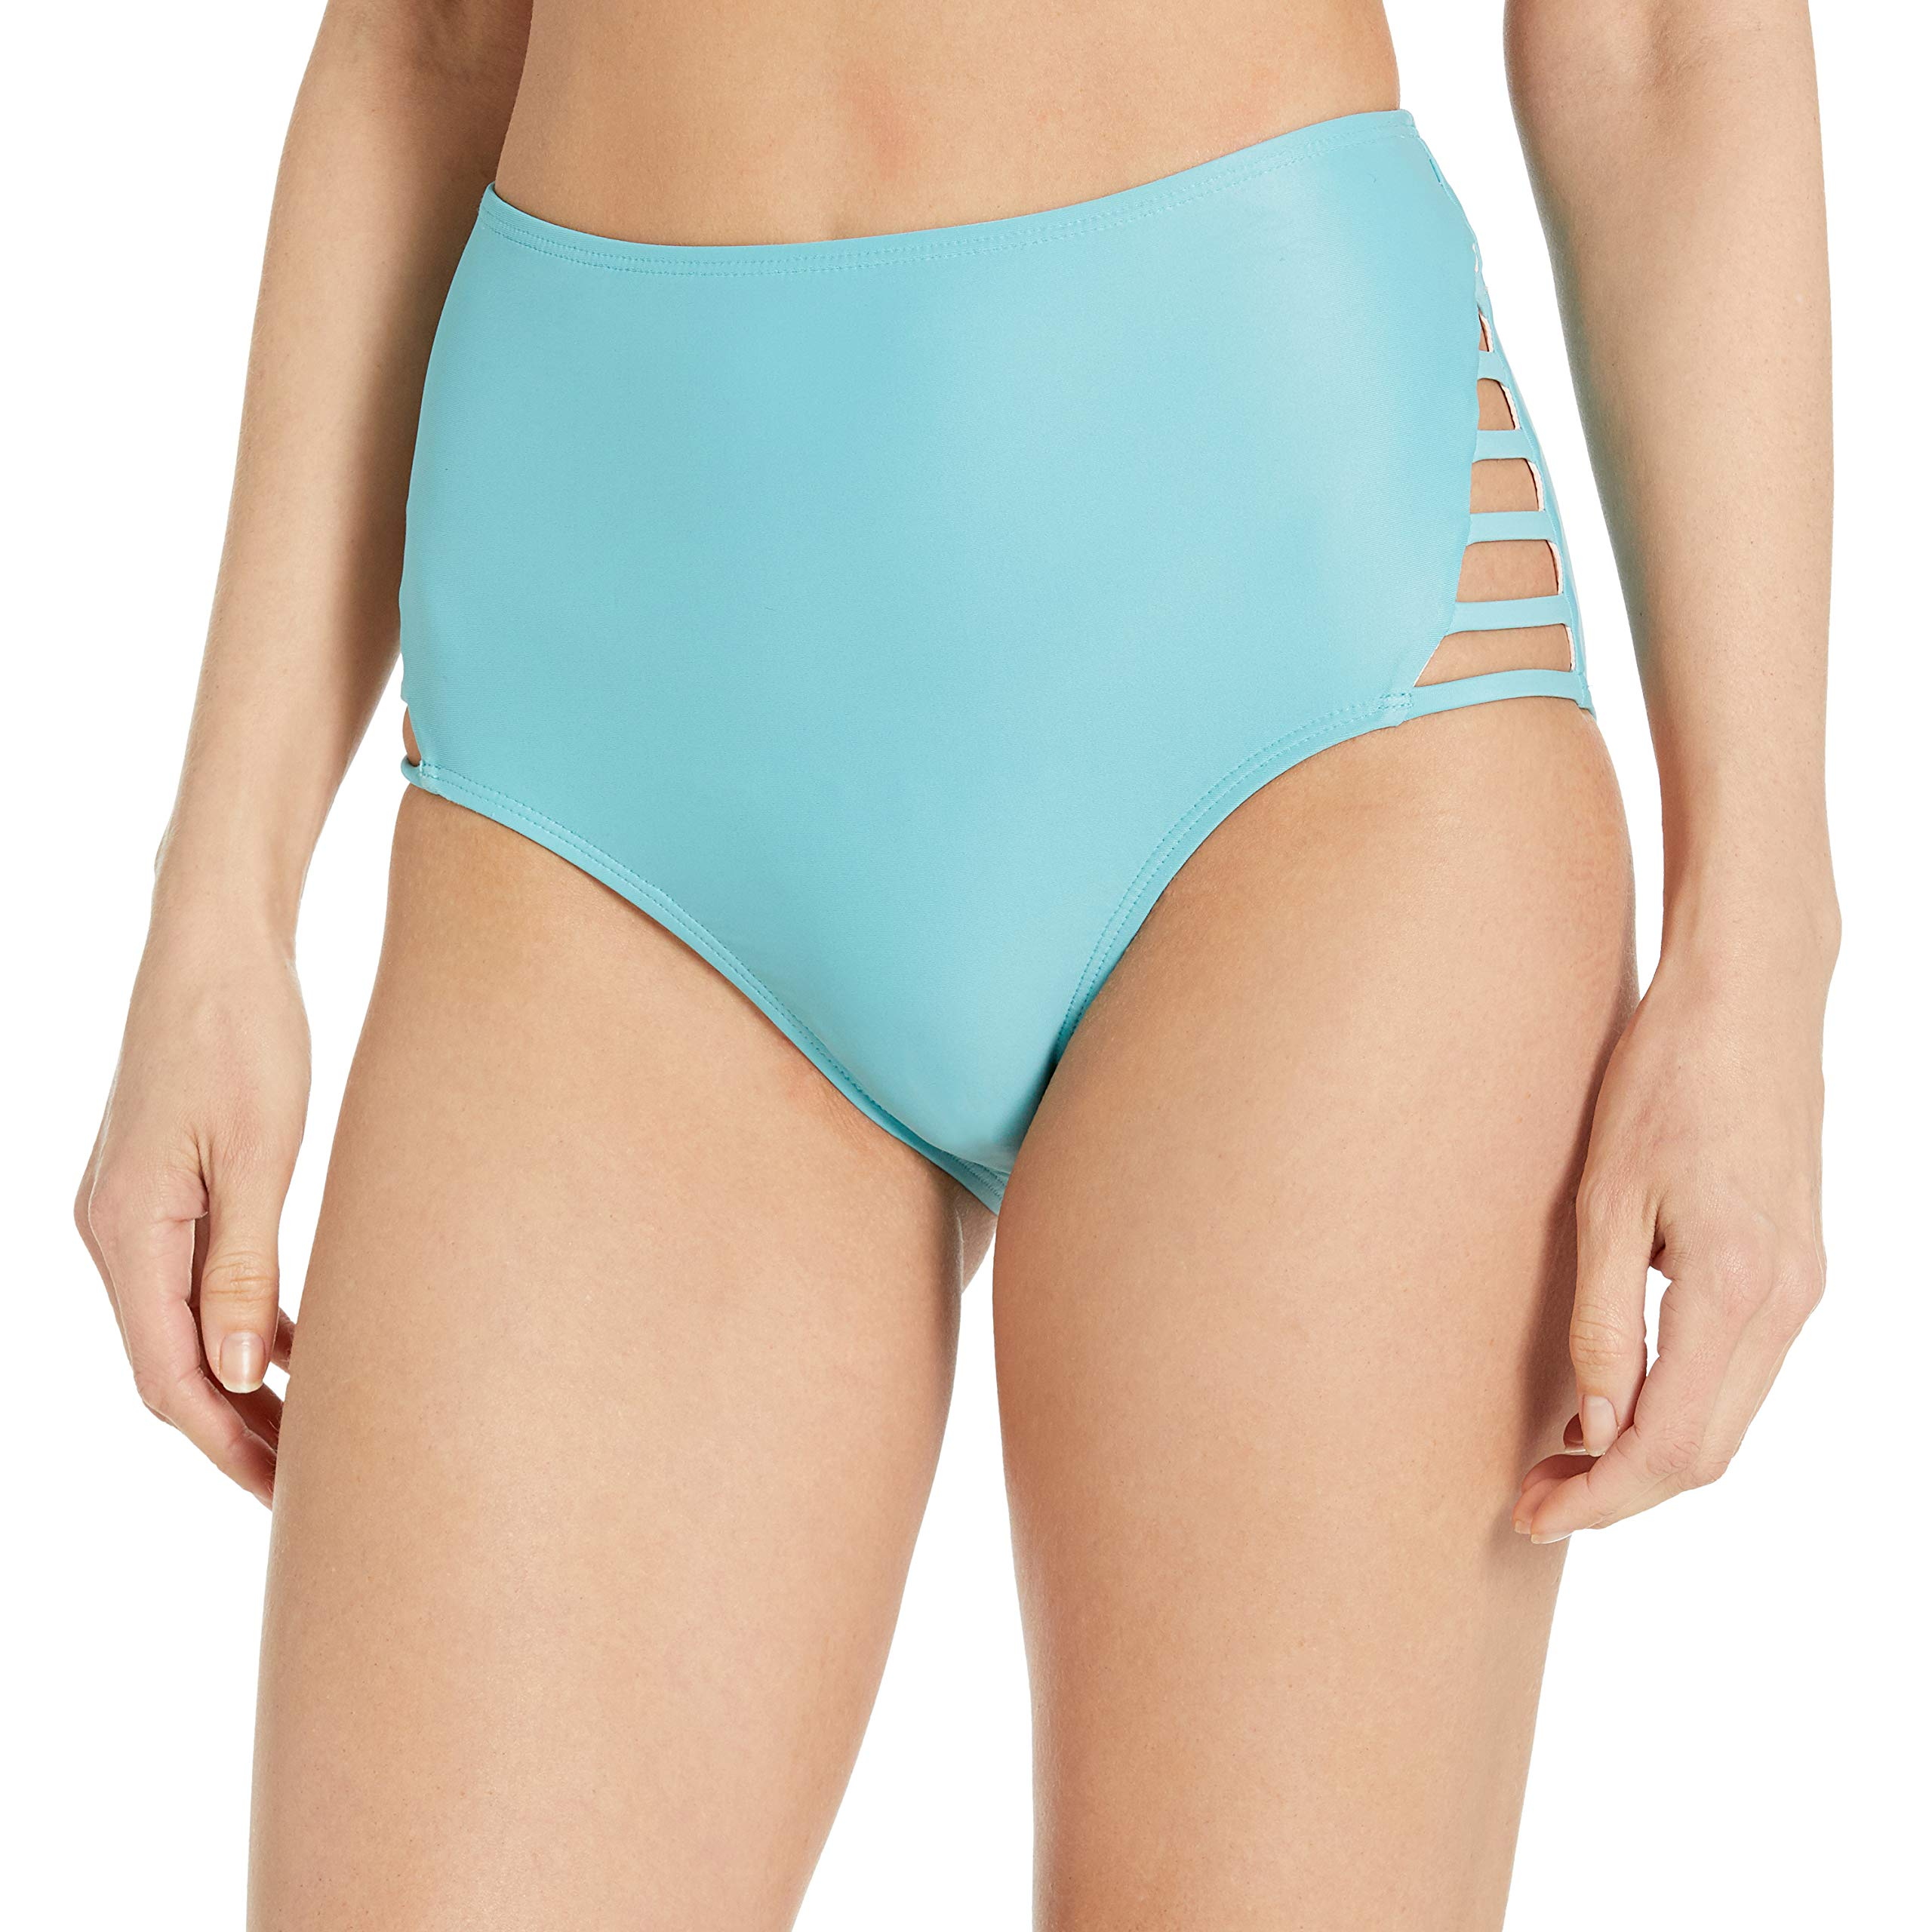 Amazon Brand - Mae Women's Swimwear Strappy High Waist Cheeky Bikini Bottom